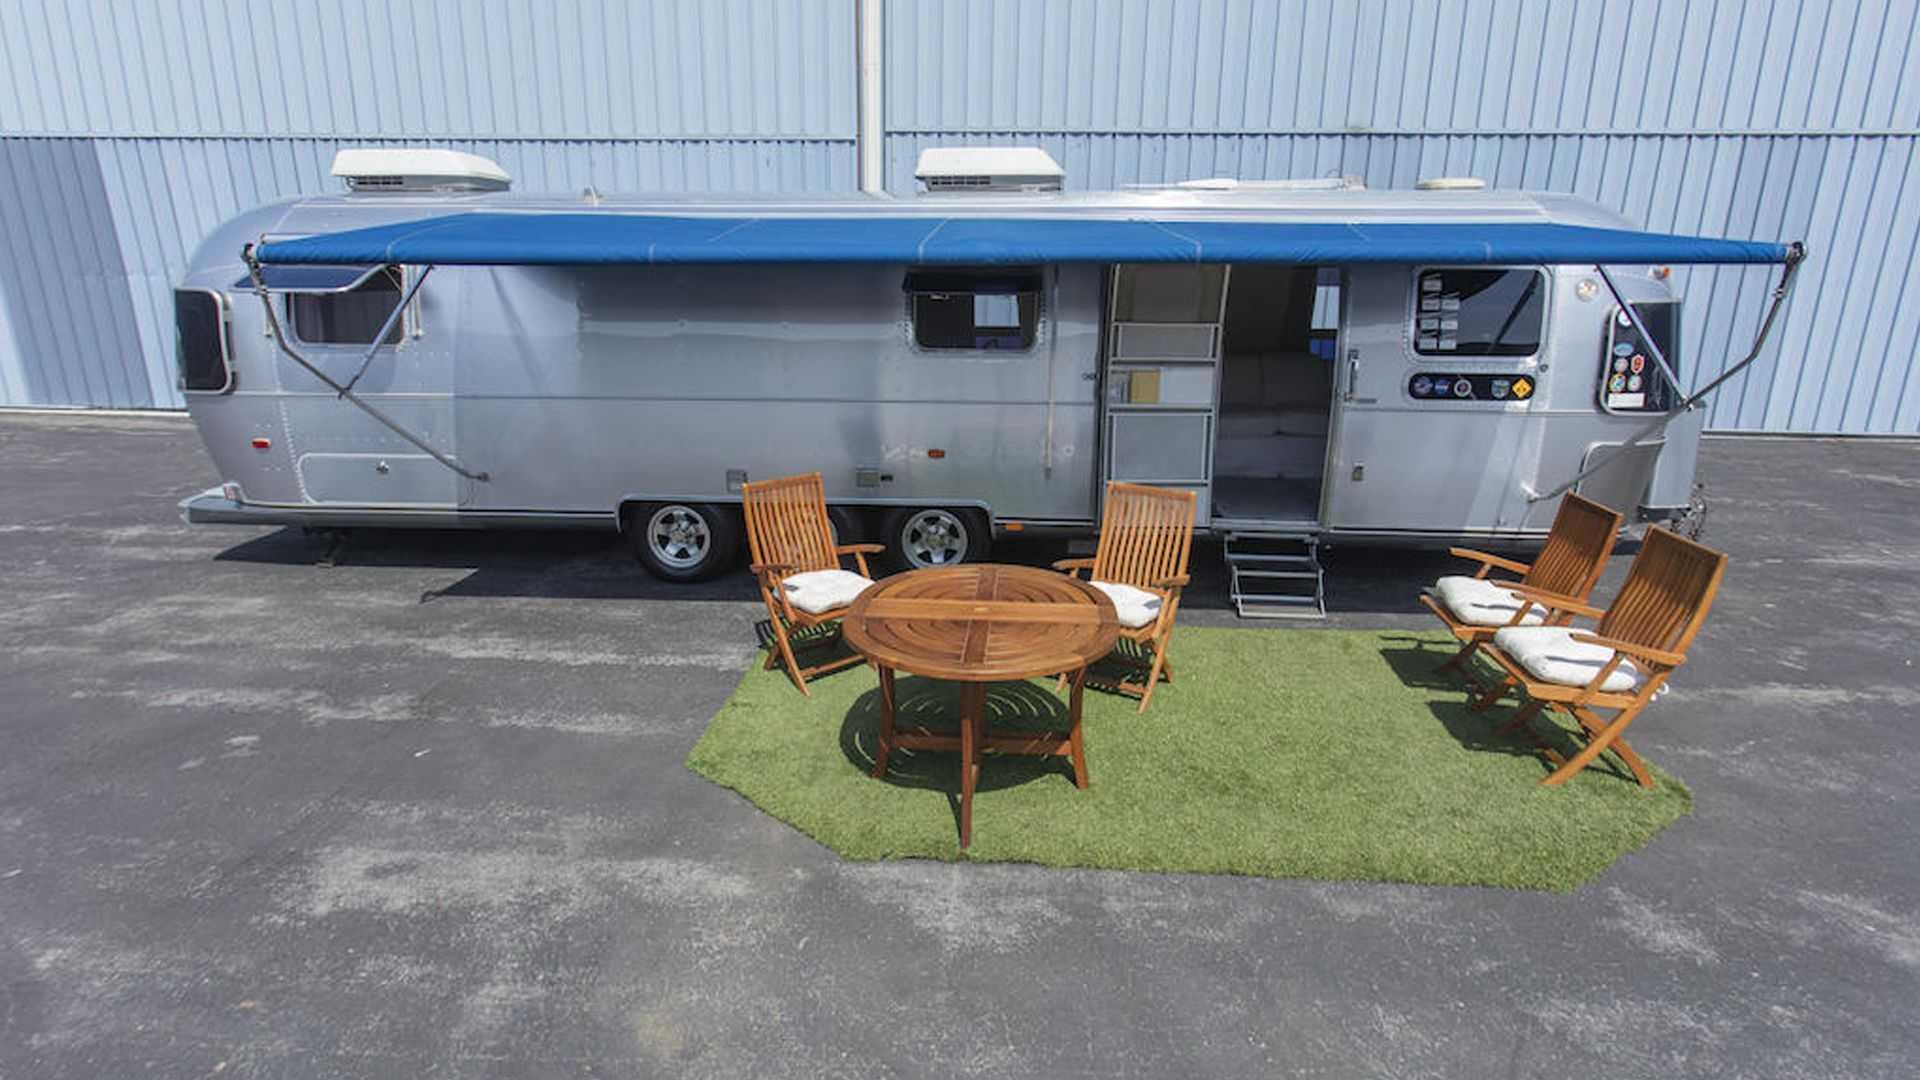 Tom-Hanks-Airstream-trailer-for-sale-3